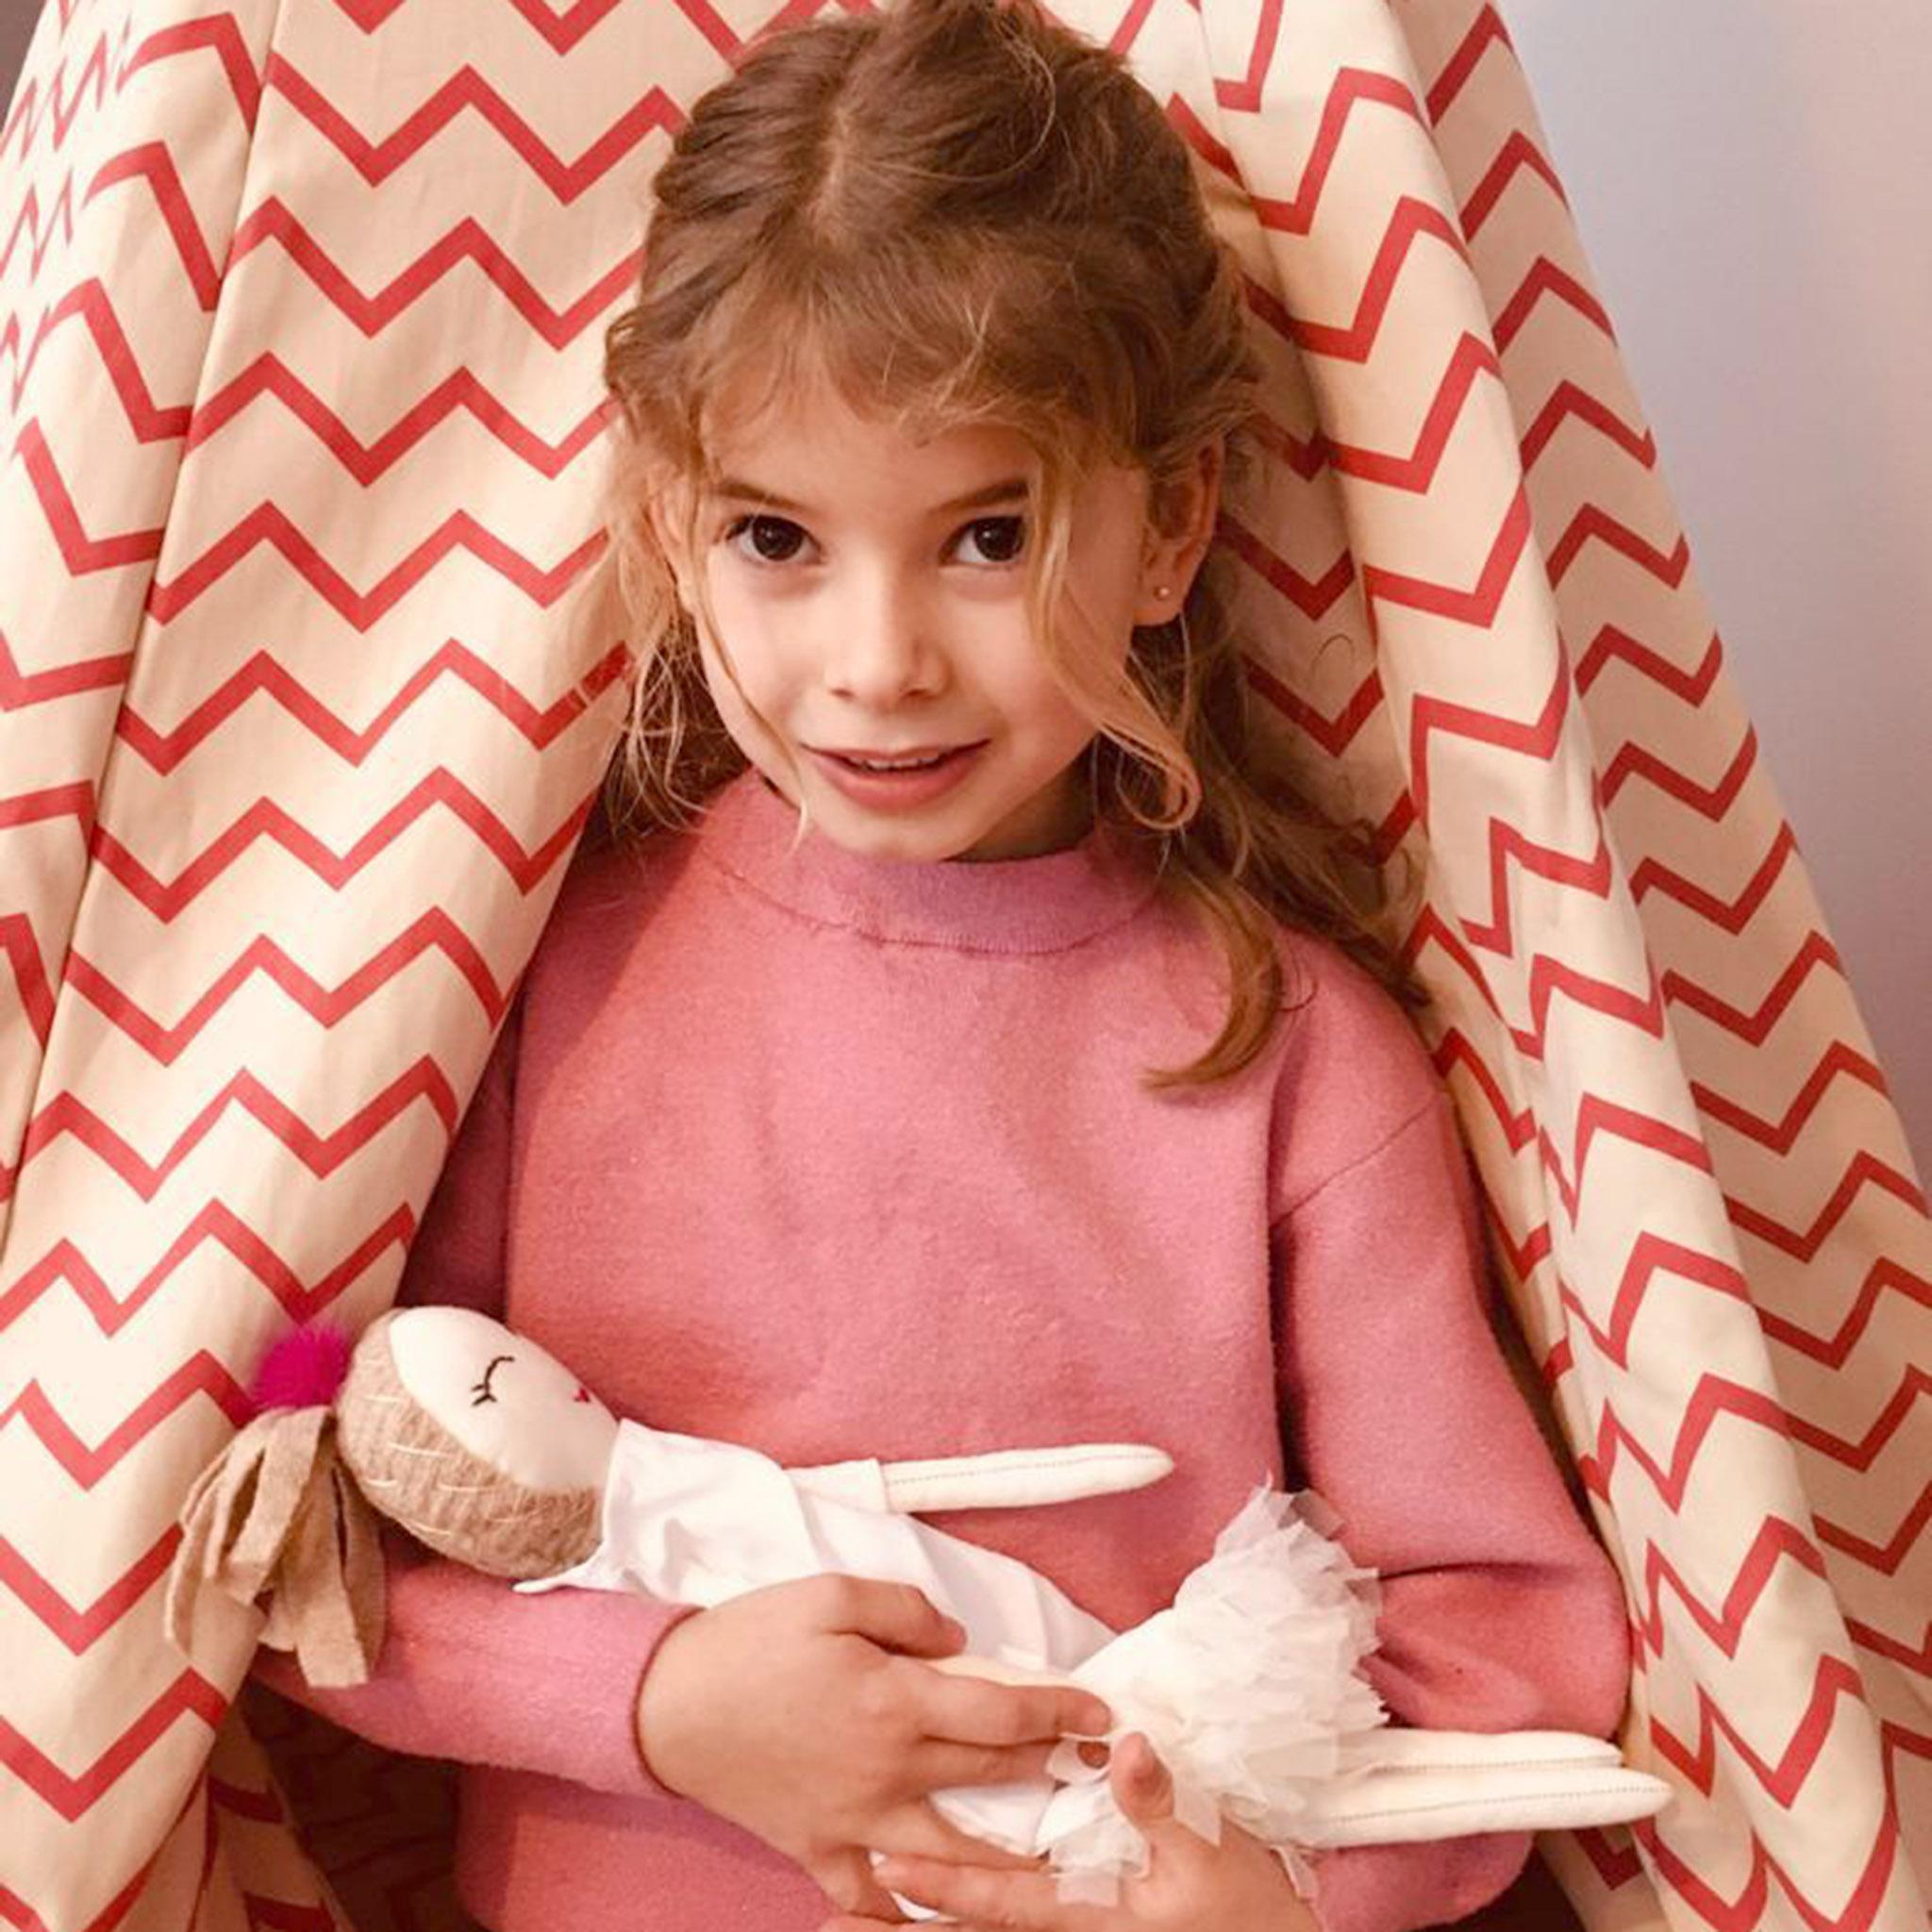 whenisnow - Arantza with favorite doll